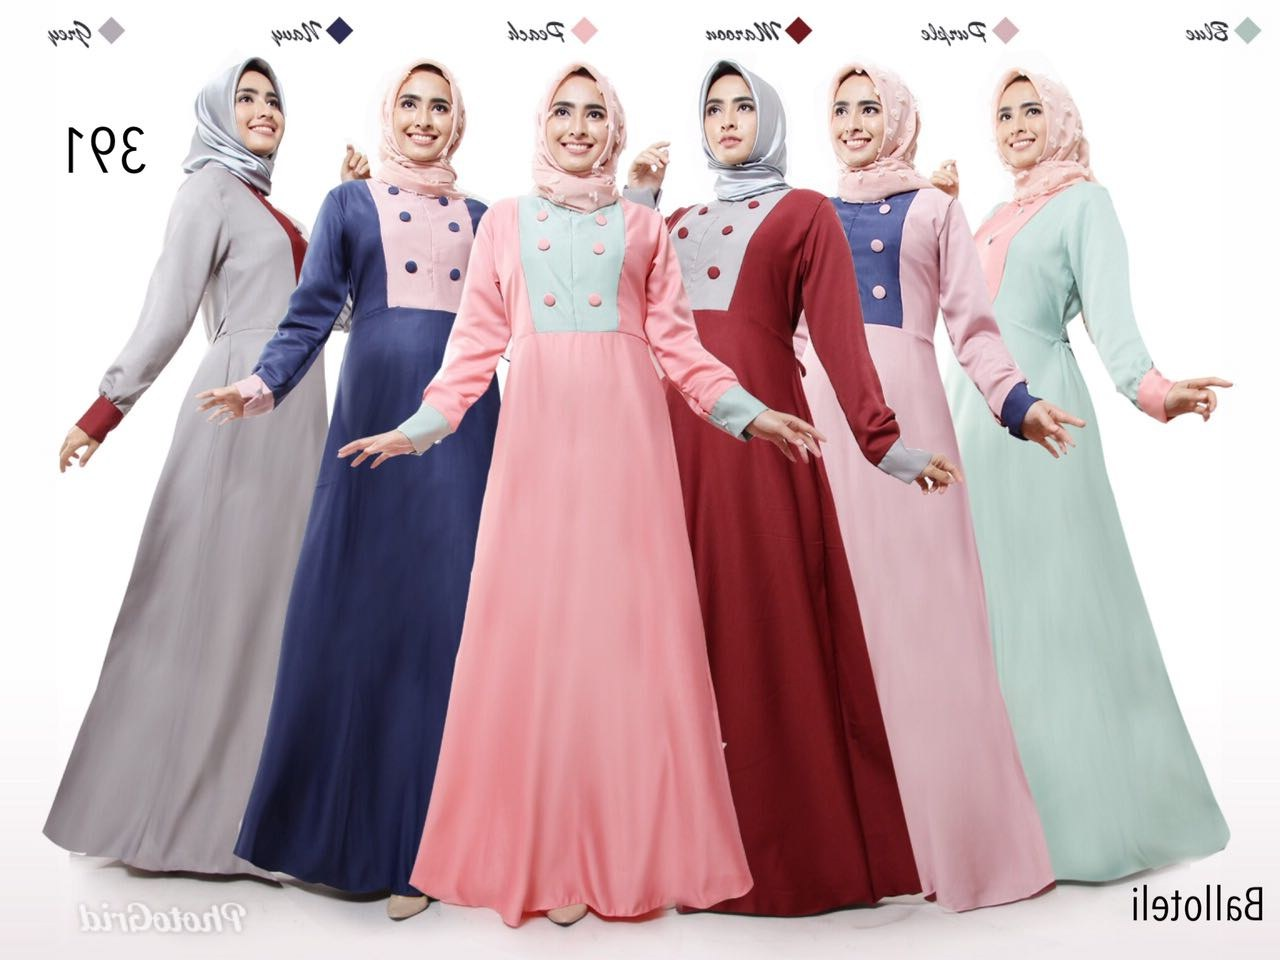 Design Baju Lebaran Hits Kvdd Baju Muslim Terbaru Yang Lagi Hits 2018